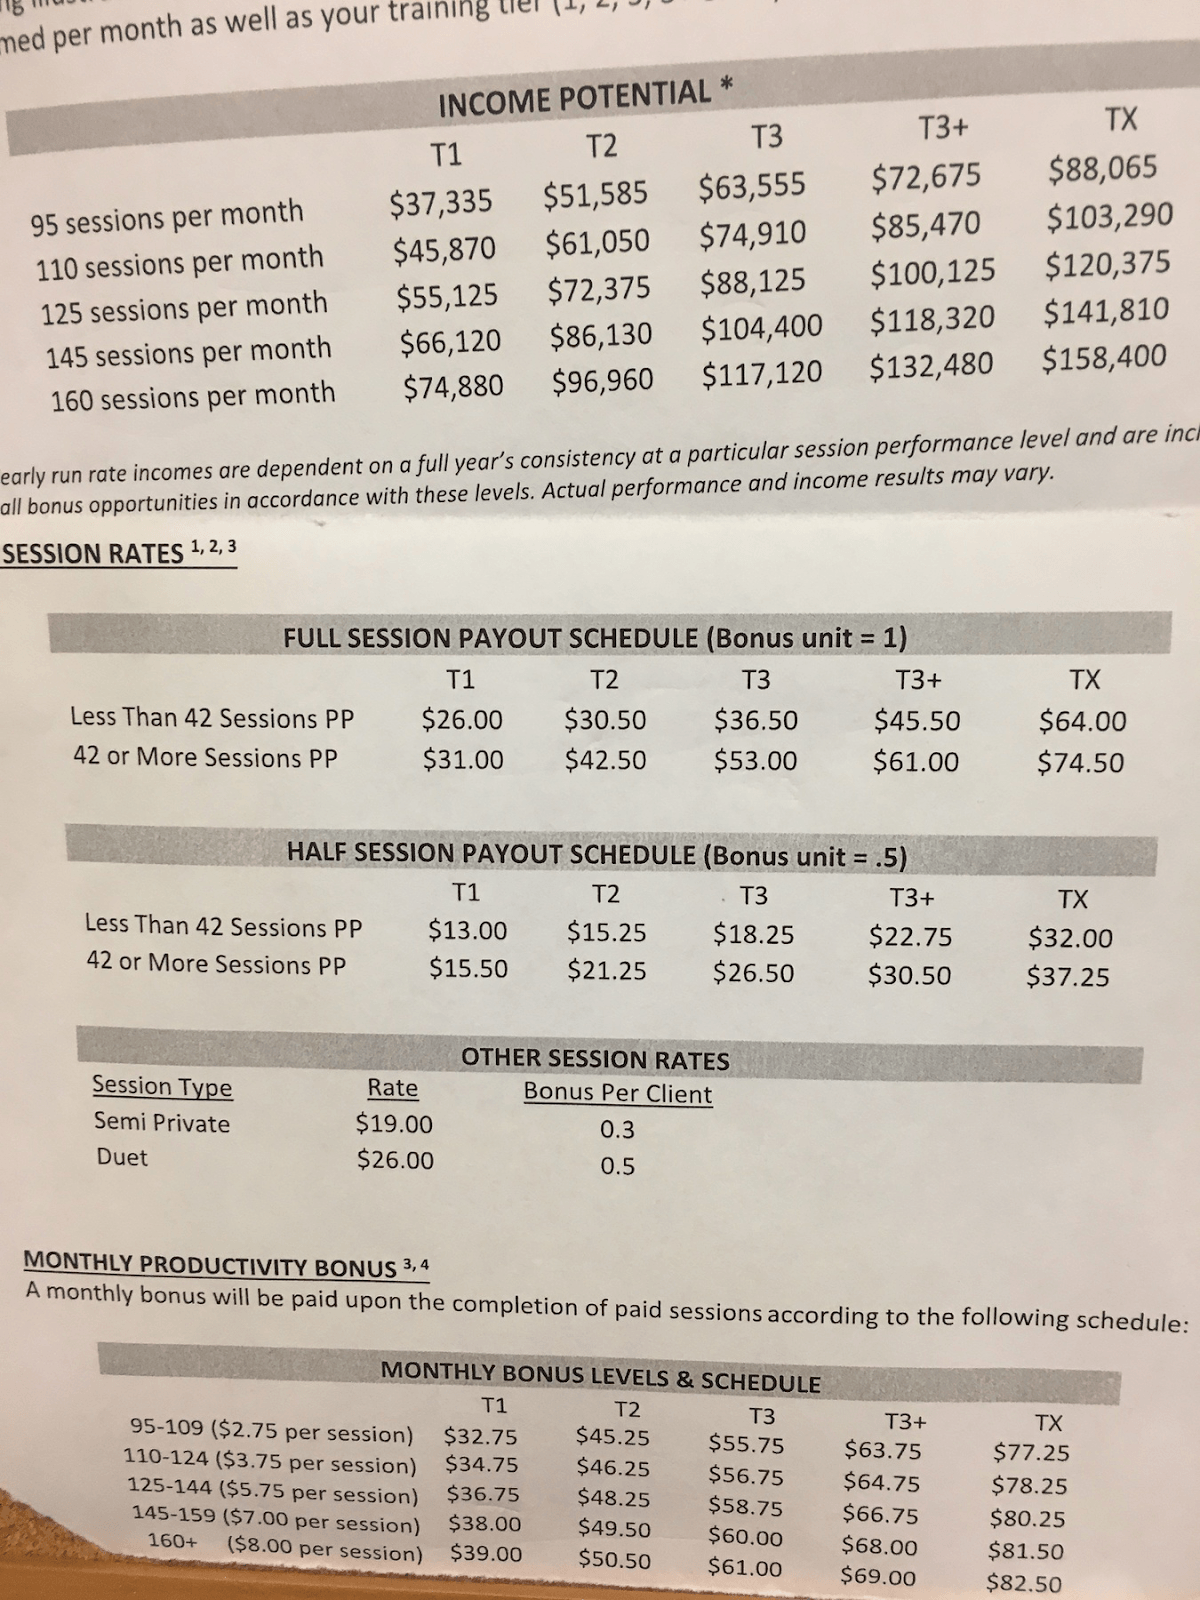 Equinox Income Potential